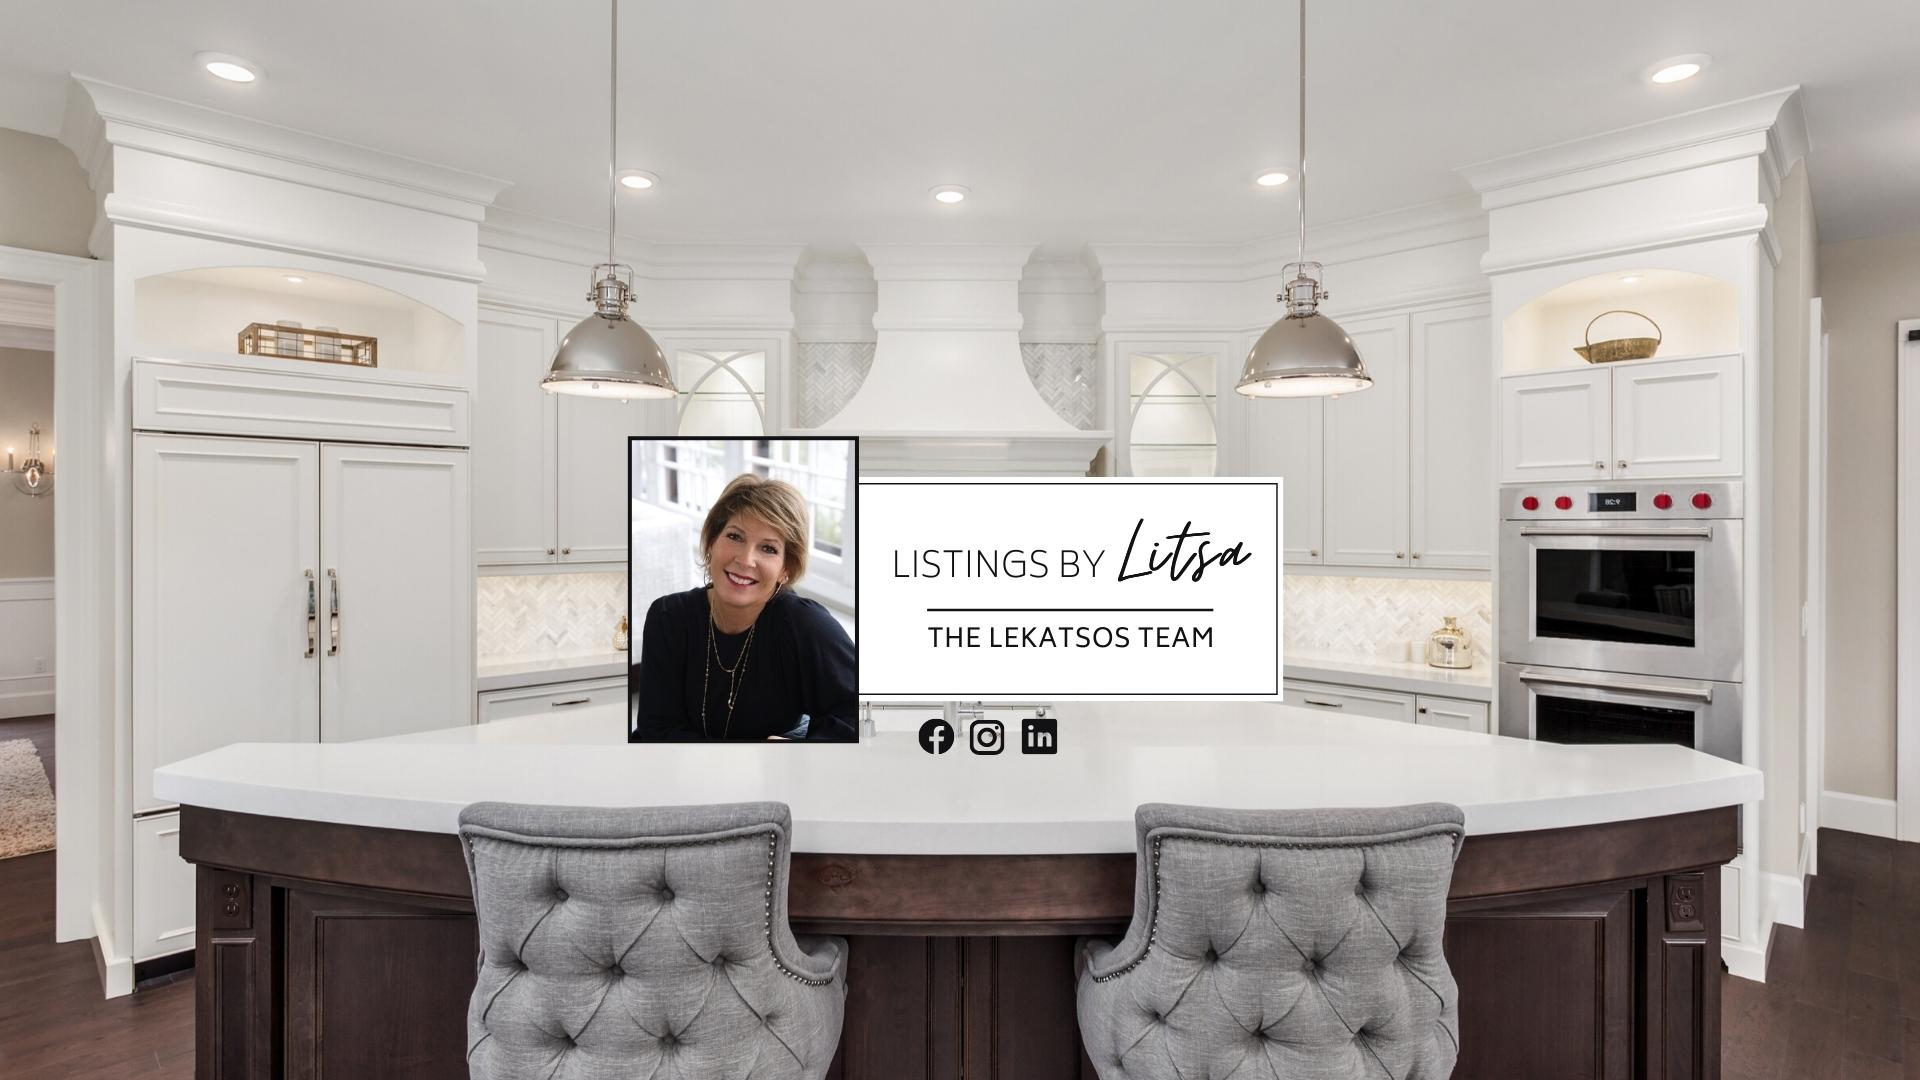 Listings by Litsa